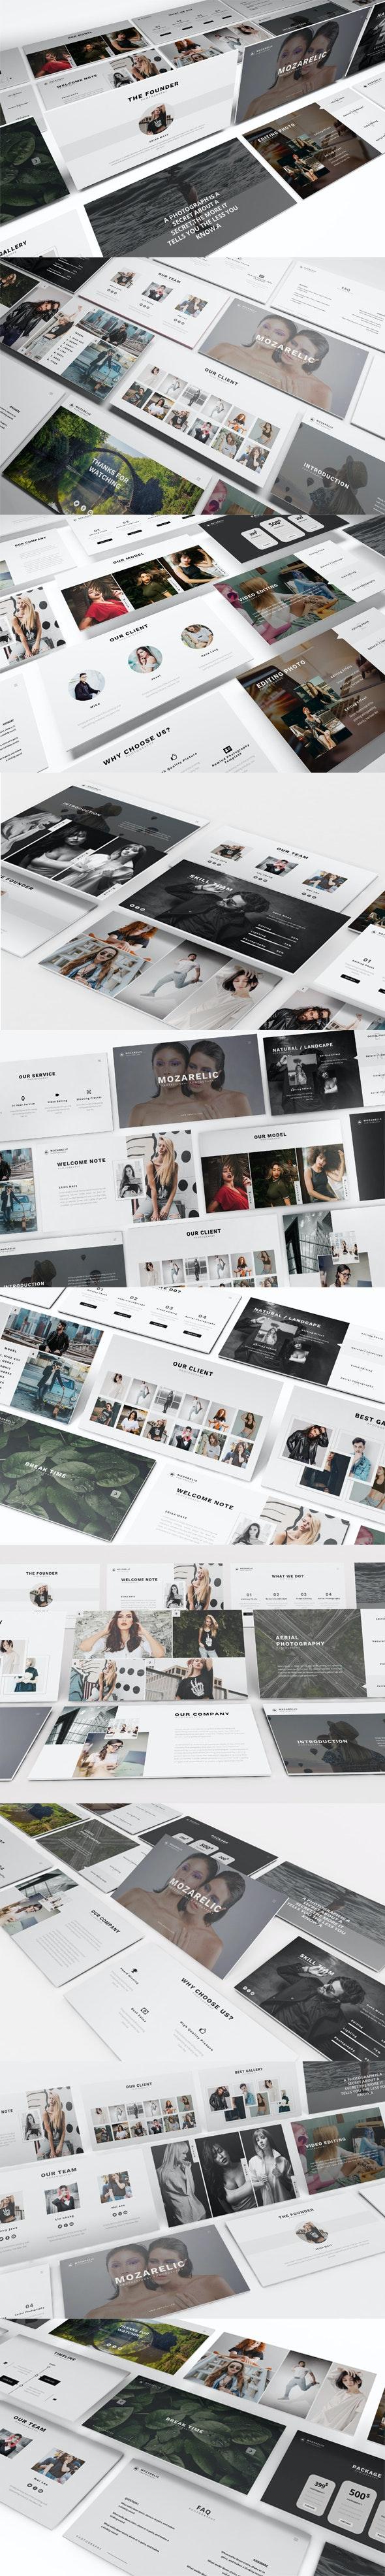 Mozarelic Photography Powerpoint Template - Presentation Templates